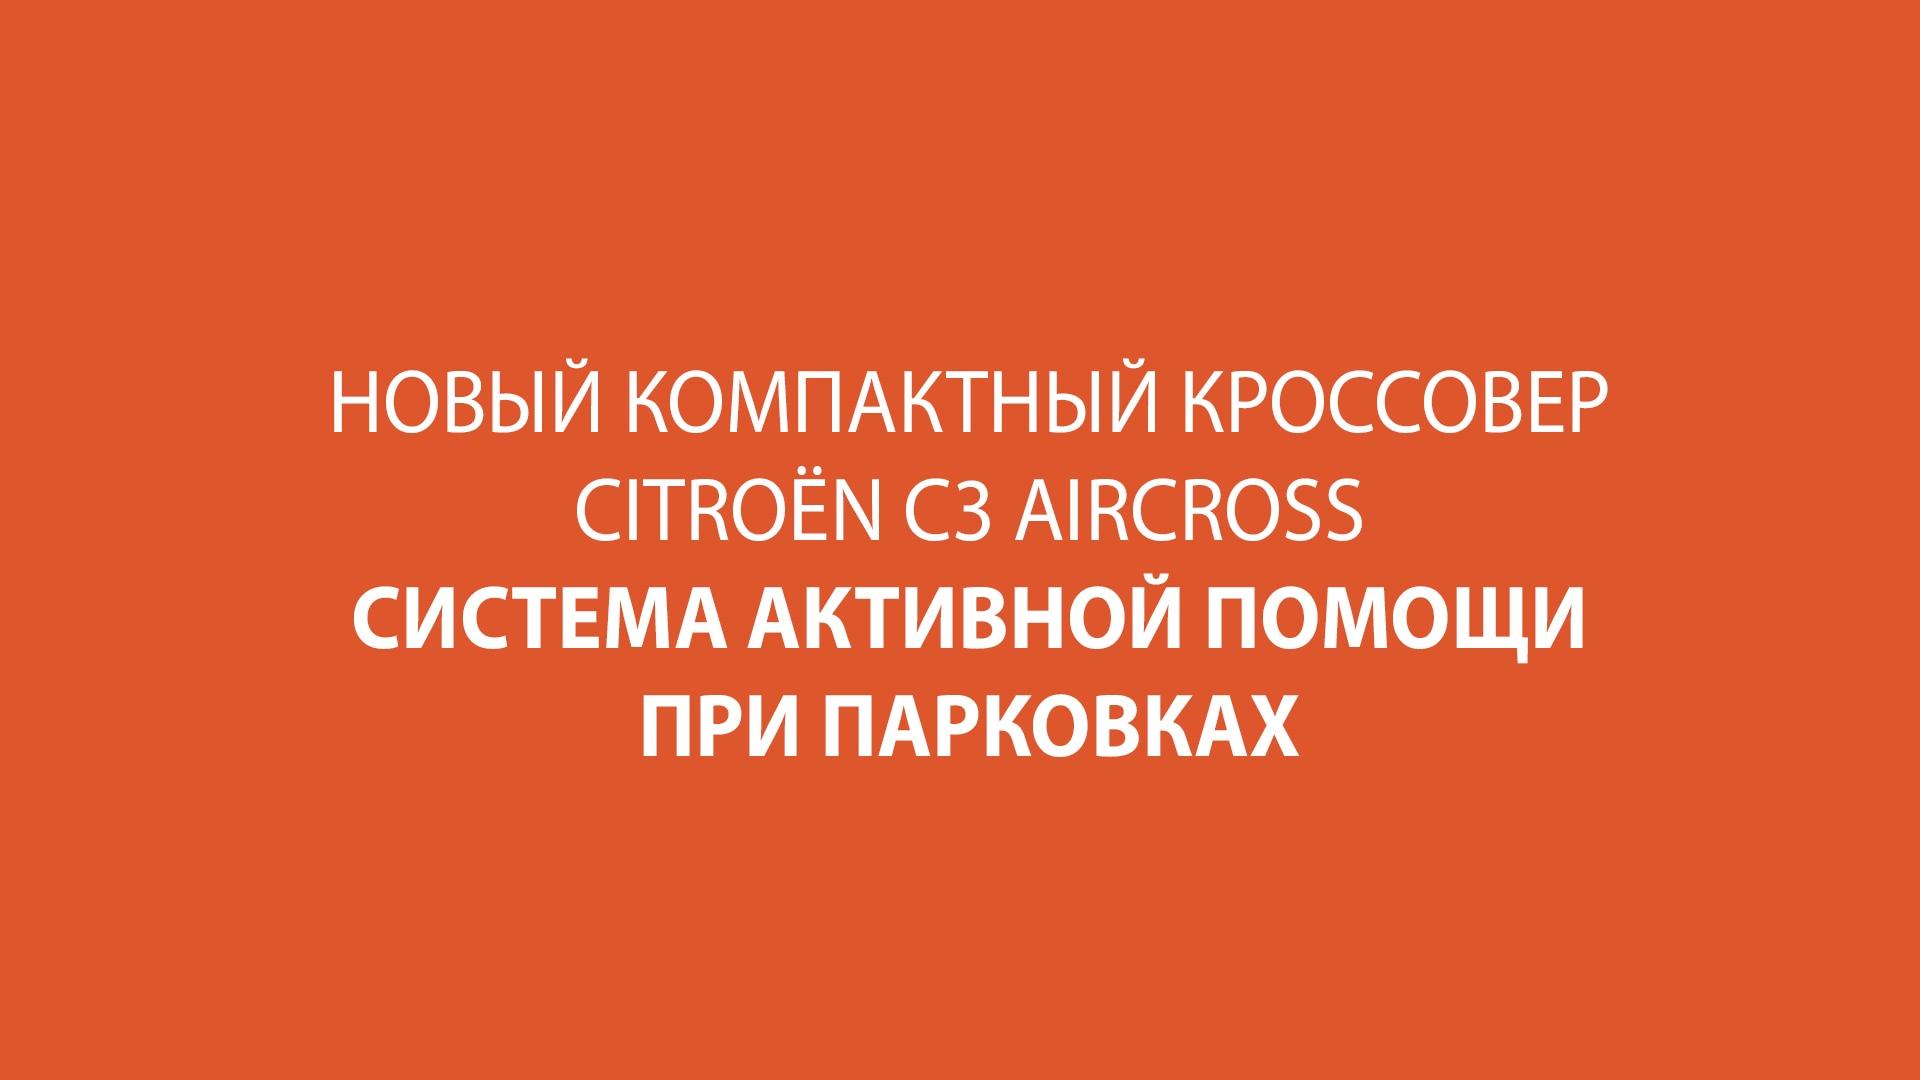 Citroën C3 Aircross - Опции